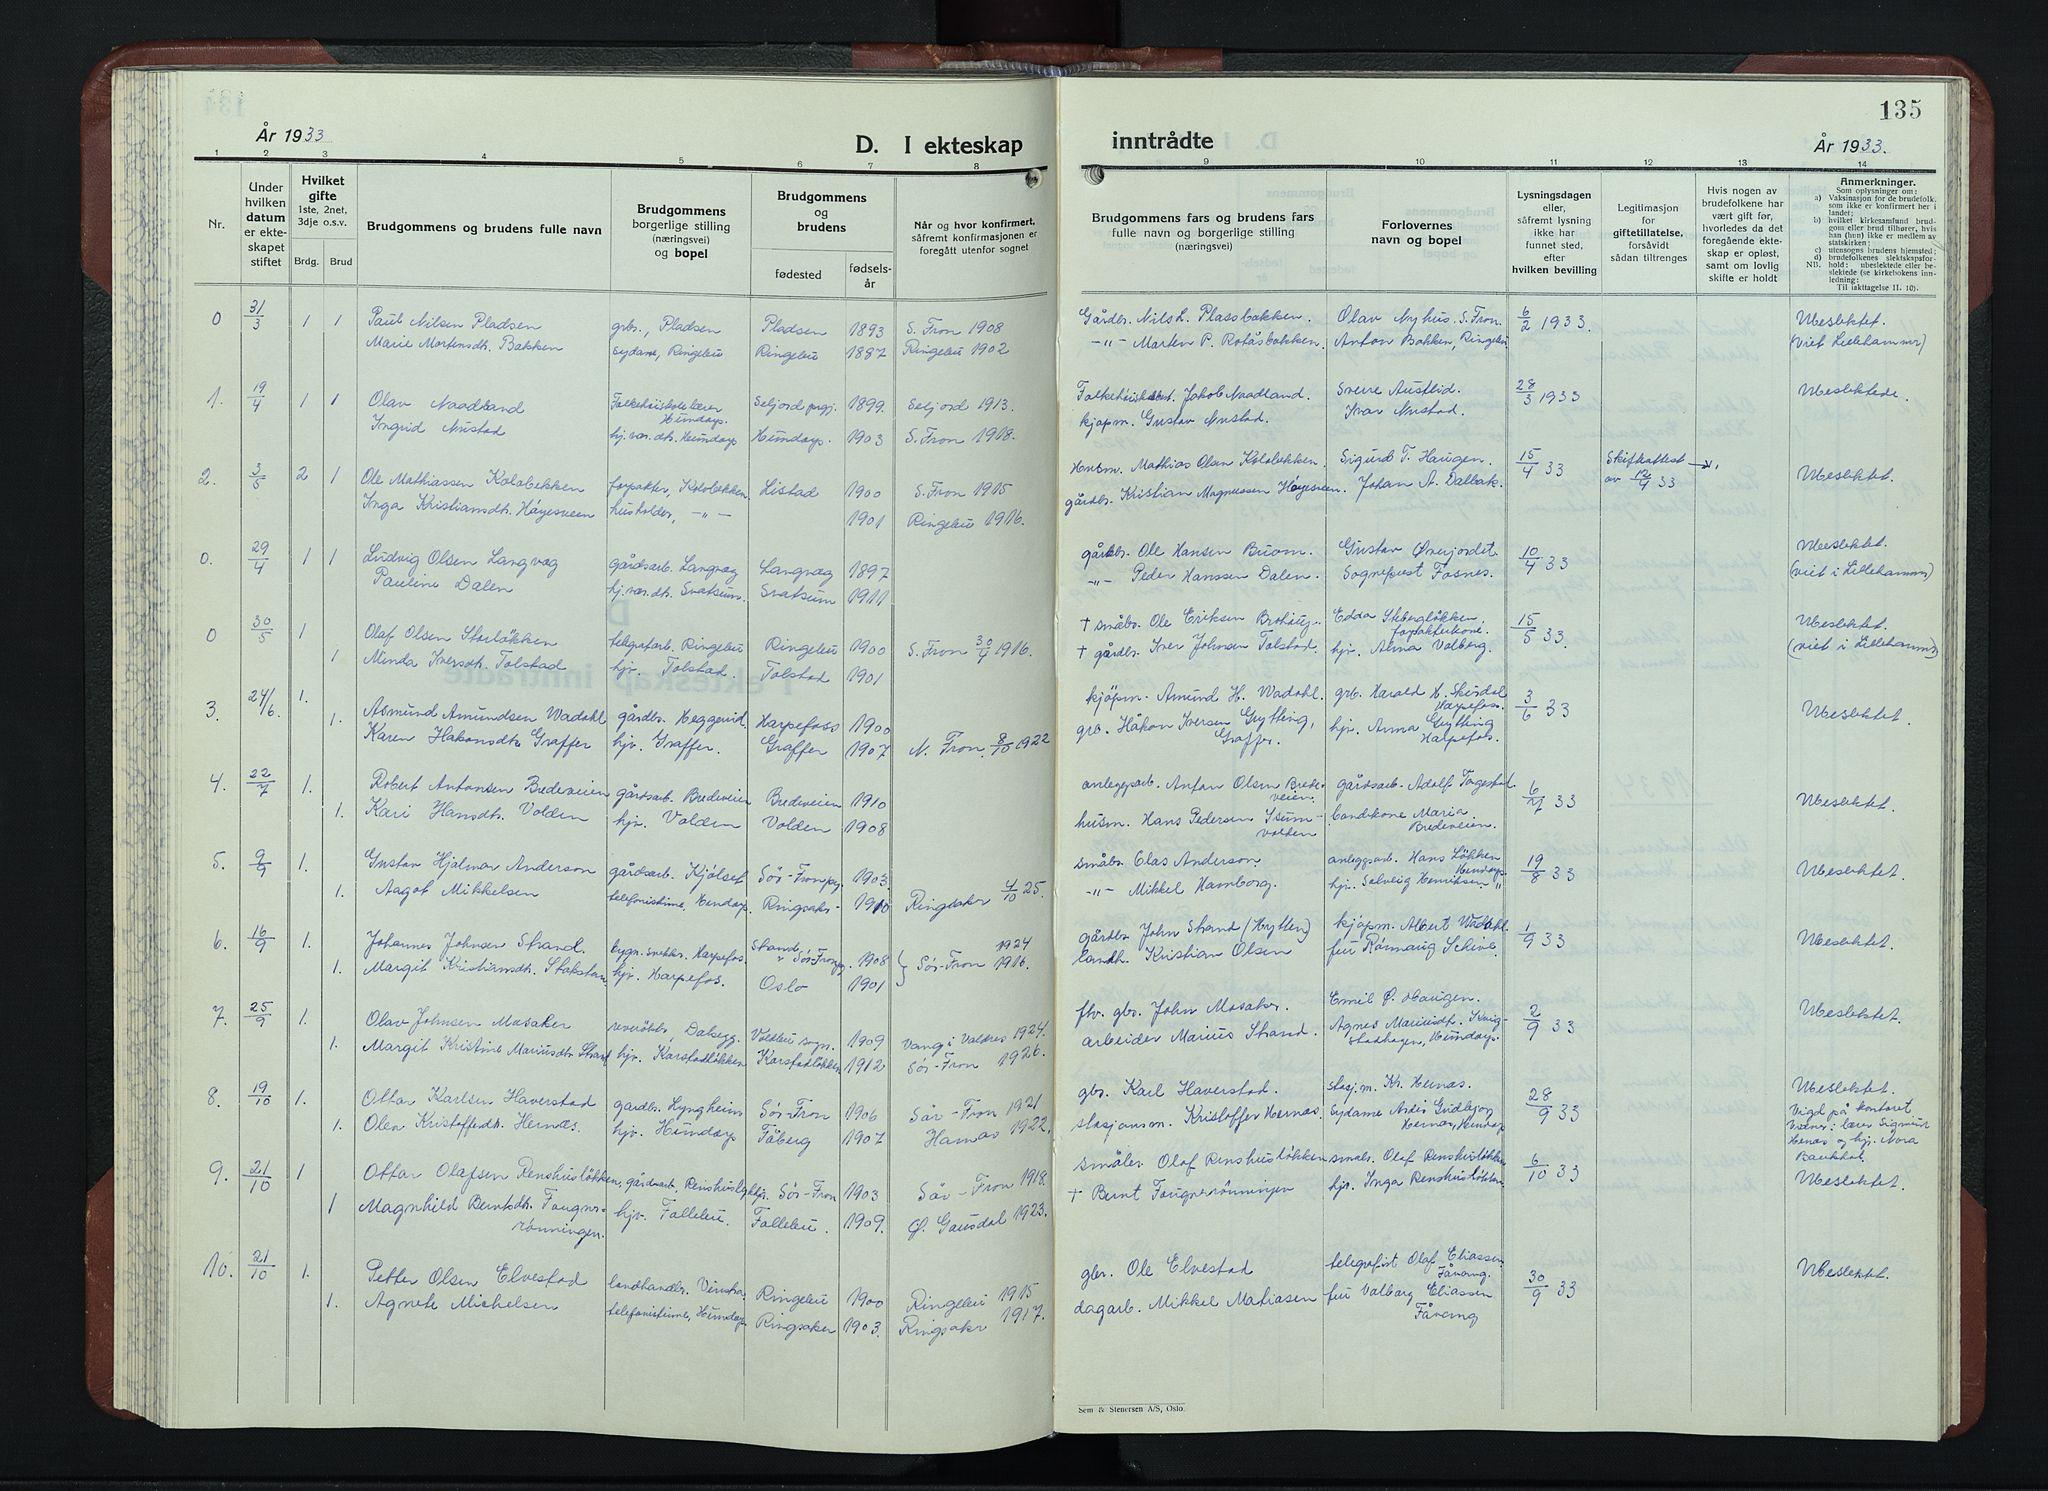 SAH, Sør-Fron prestekontor, H/Ha/Hab/L0006: Klokkerbok nr. 6, 1933-1948, s. 135